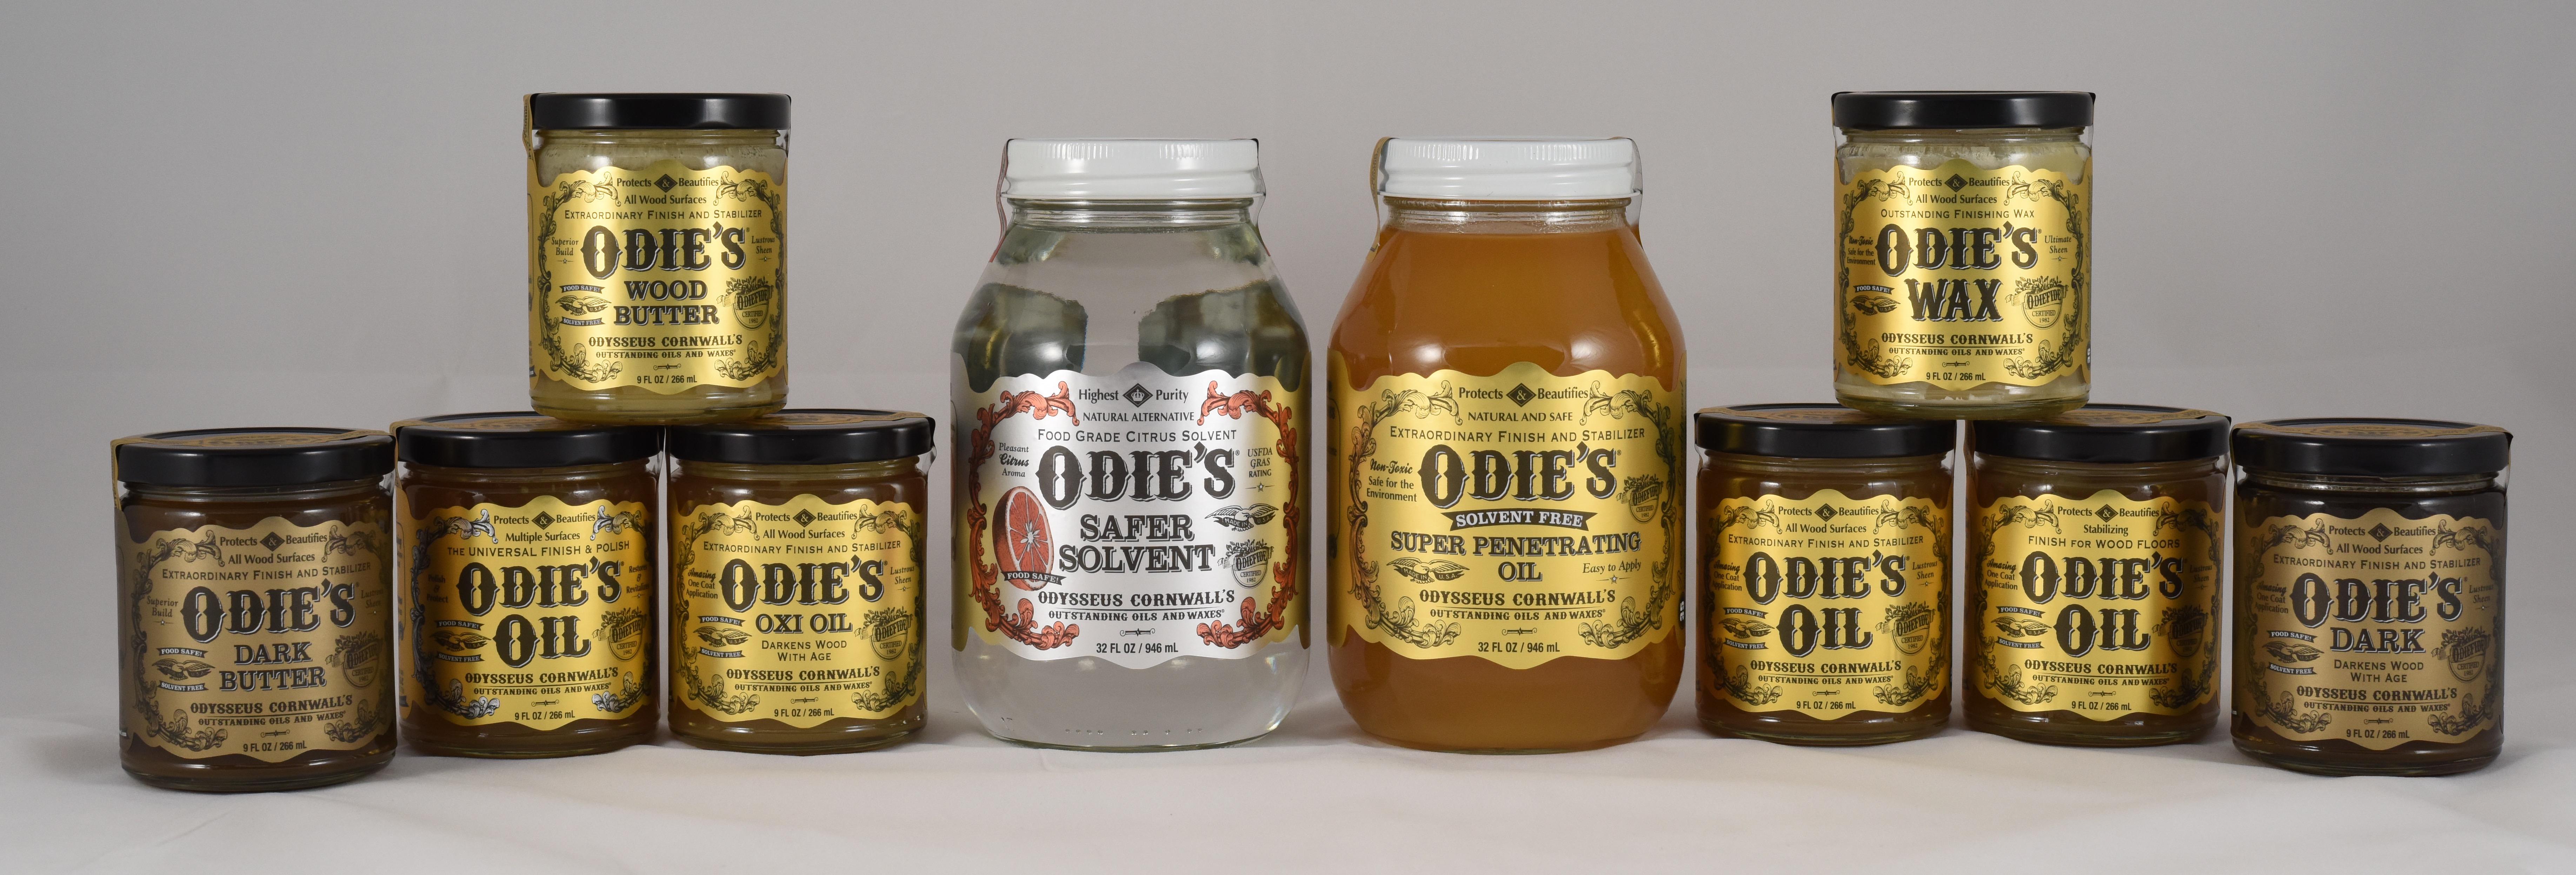 odiesline-product.jpg